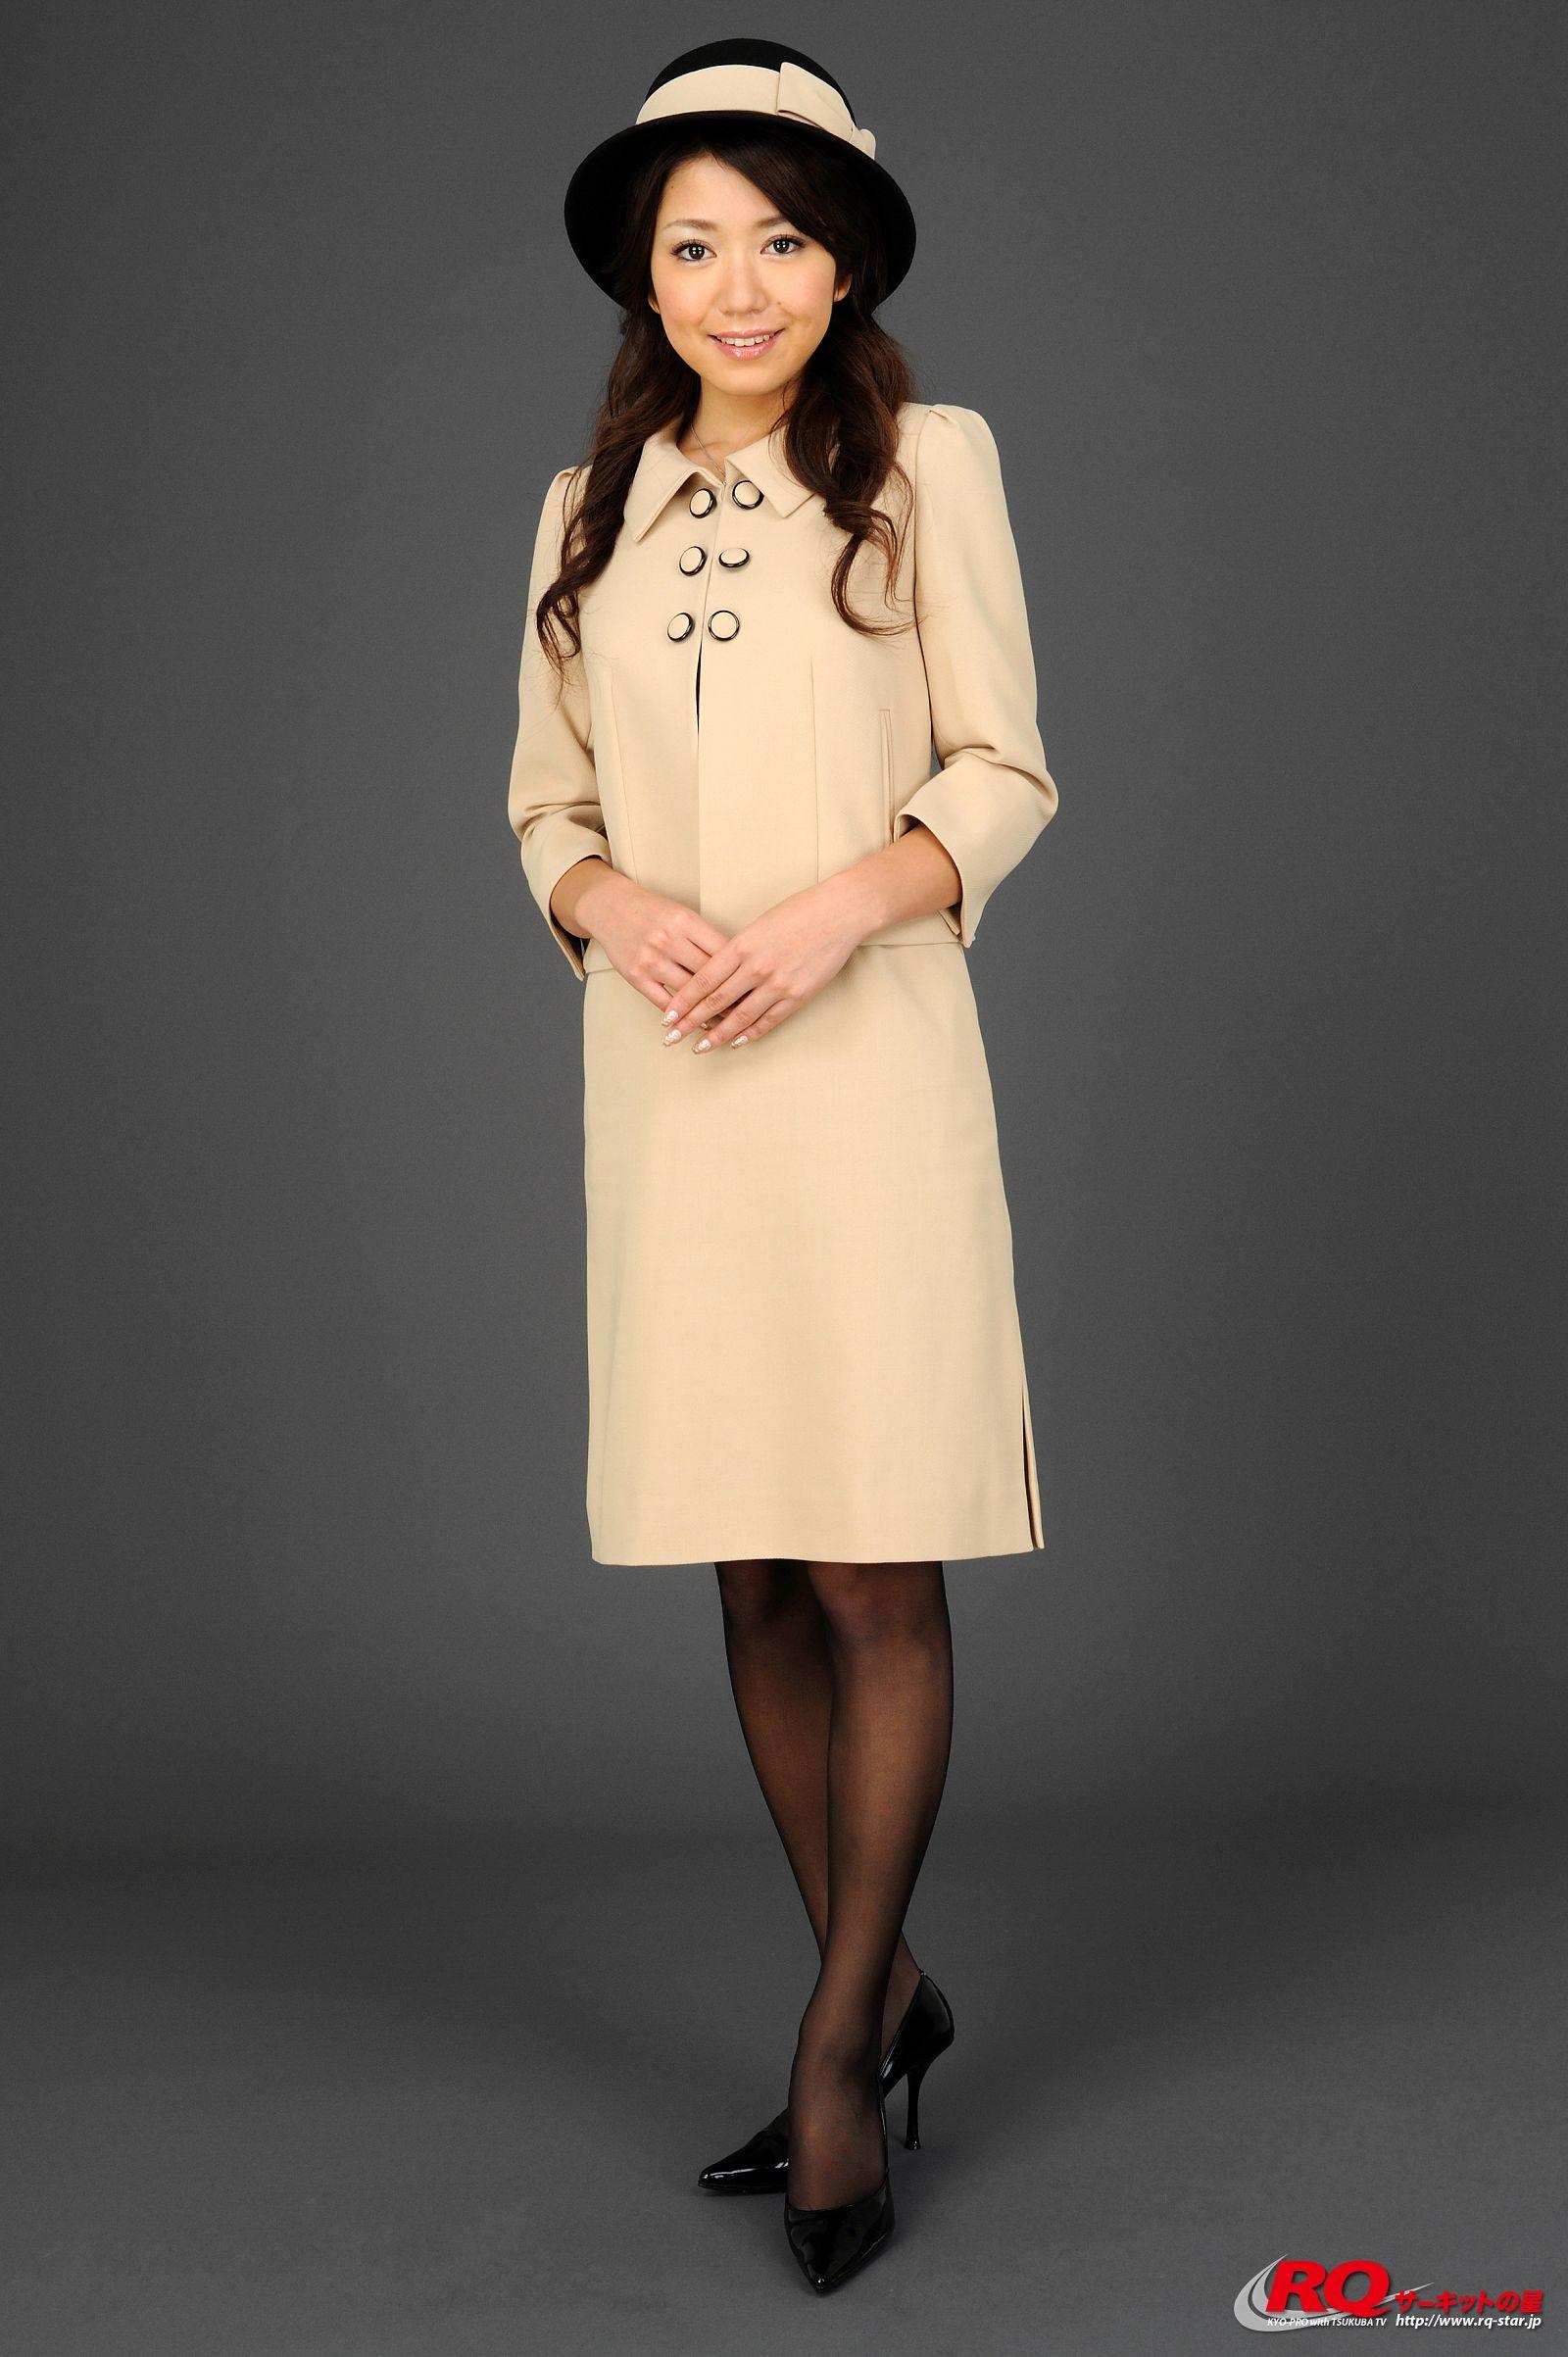 [RQ STAR美女] NO.00115 Keiko Inagaki 稲垣慶子 Elevator Girl[105P] RQ STAR 第2张